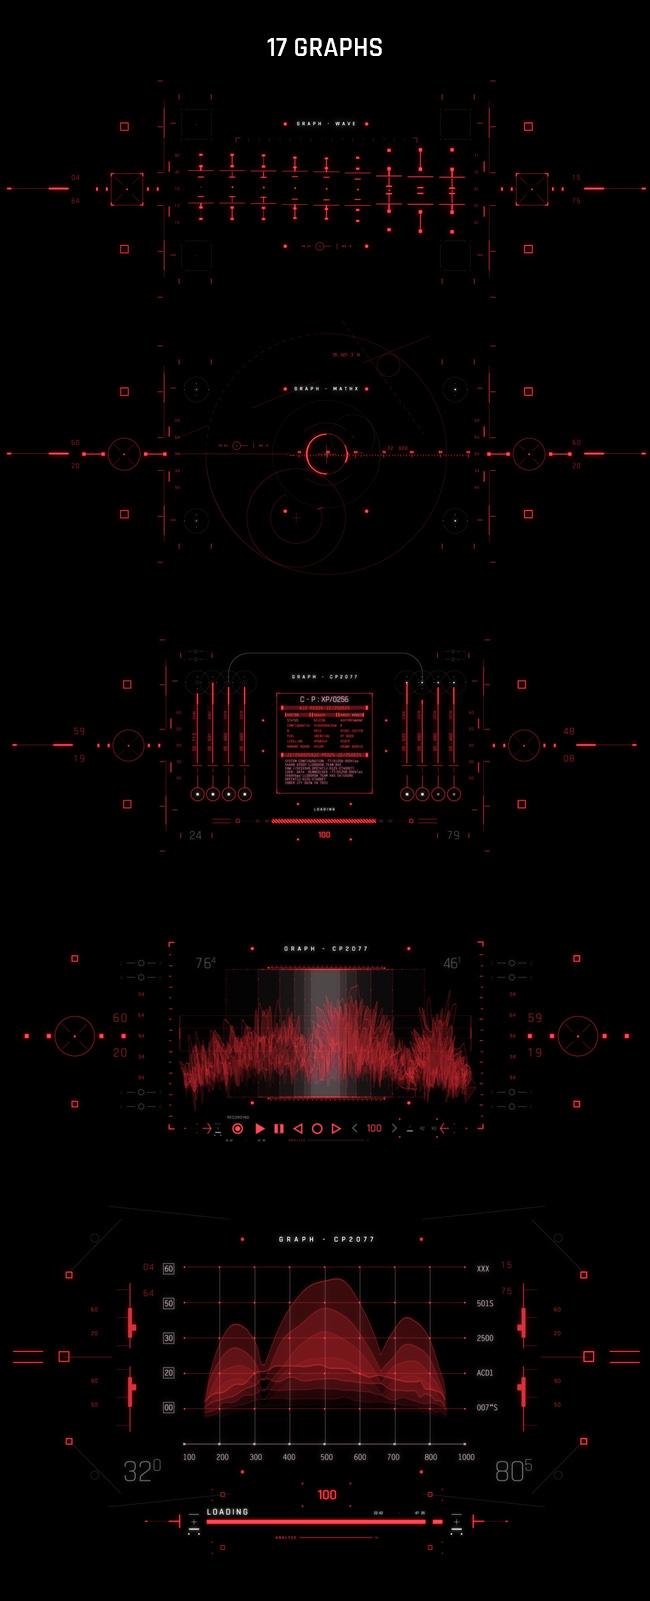 AE脚本-500个HUD高科技赛博朋克UI科幻界面元素动画预设包 Cyberpunk HUD UI 500+ 已修复中文版AE表达式报错插图25